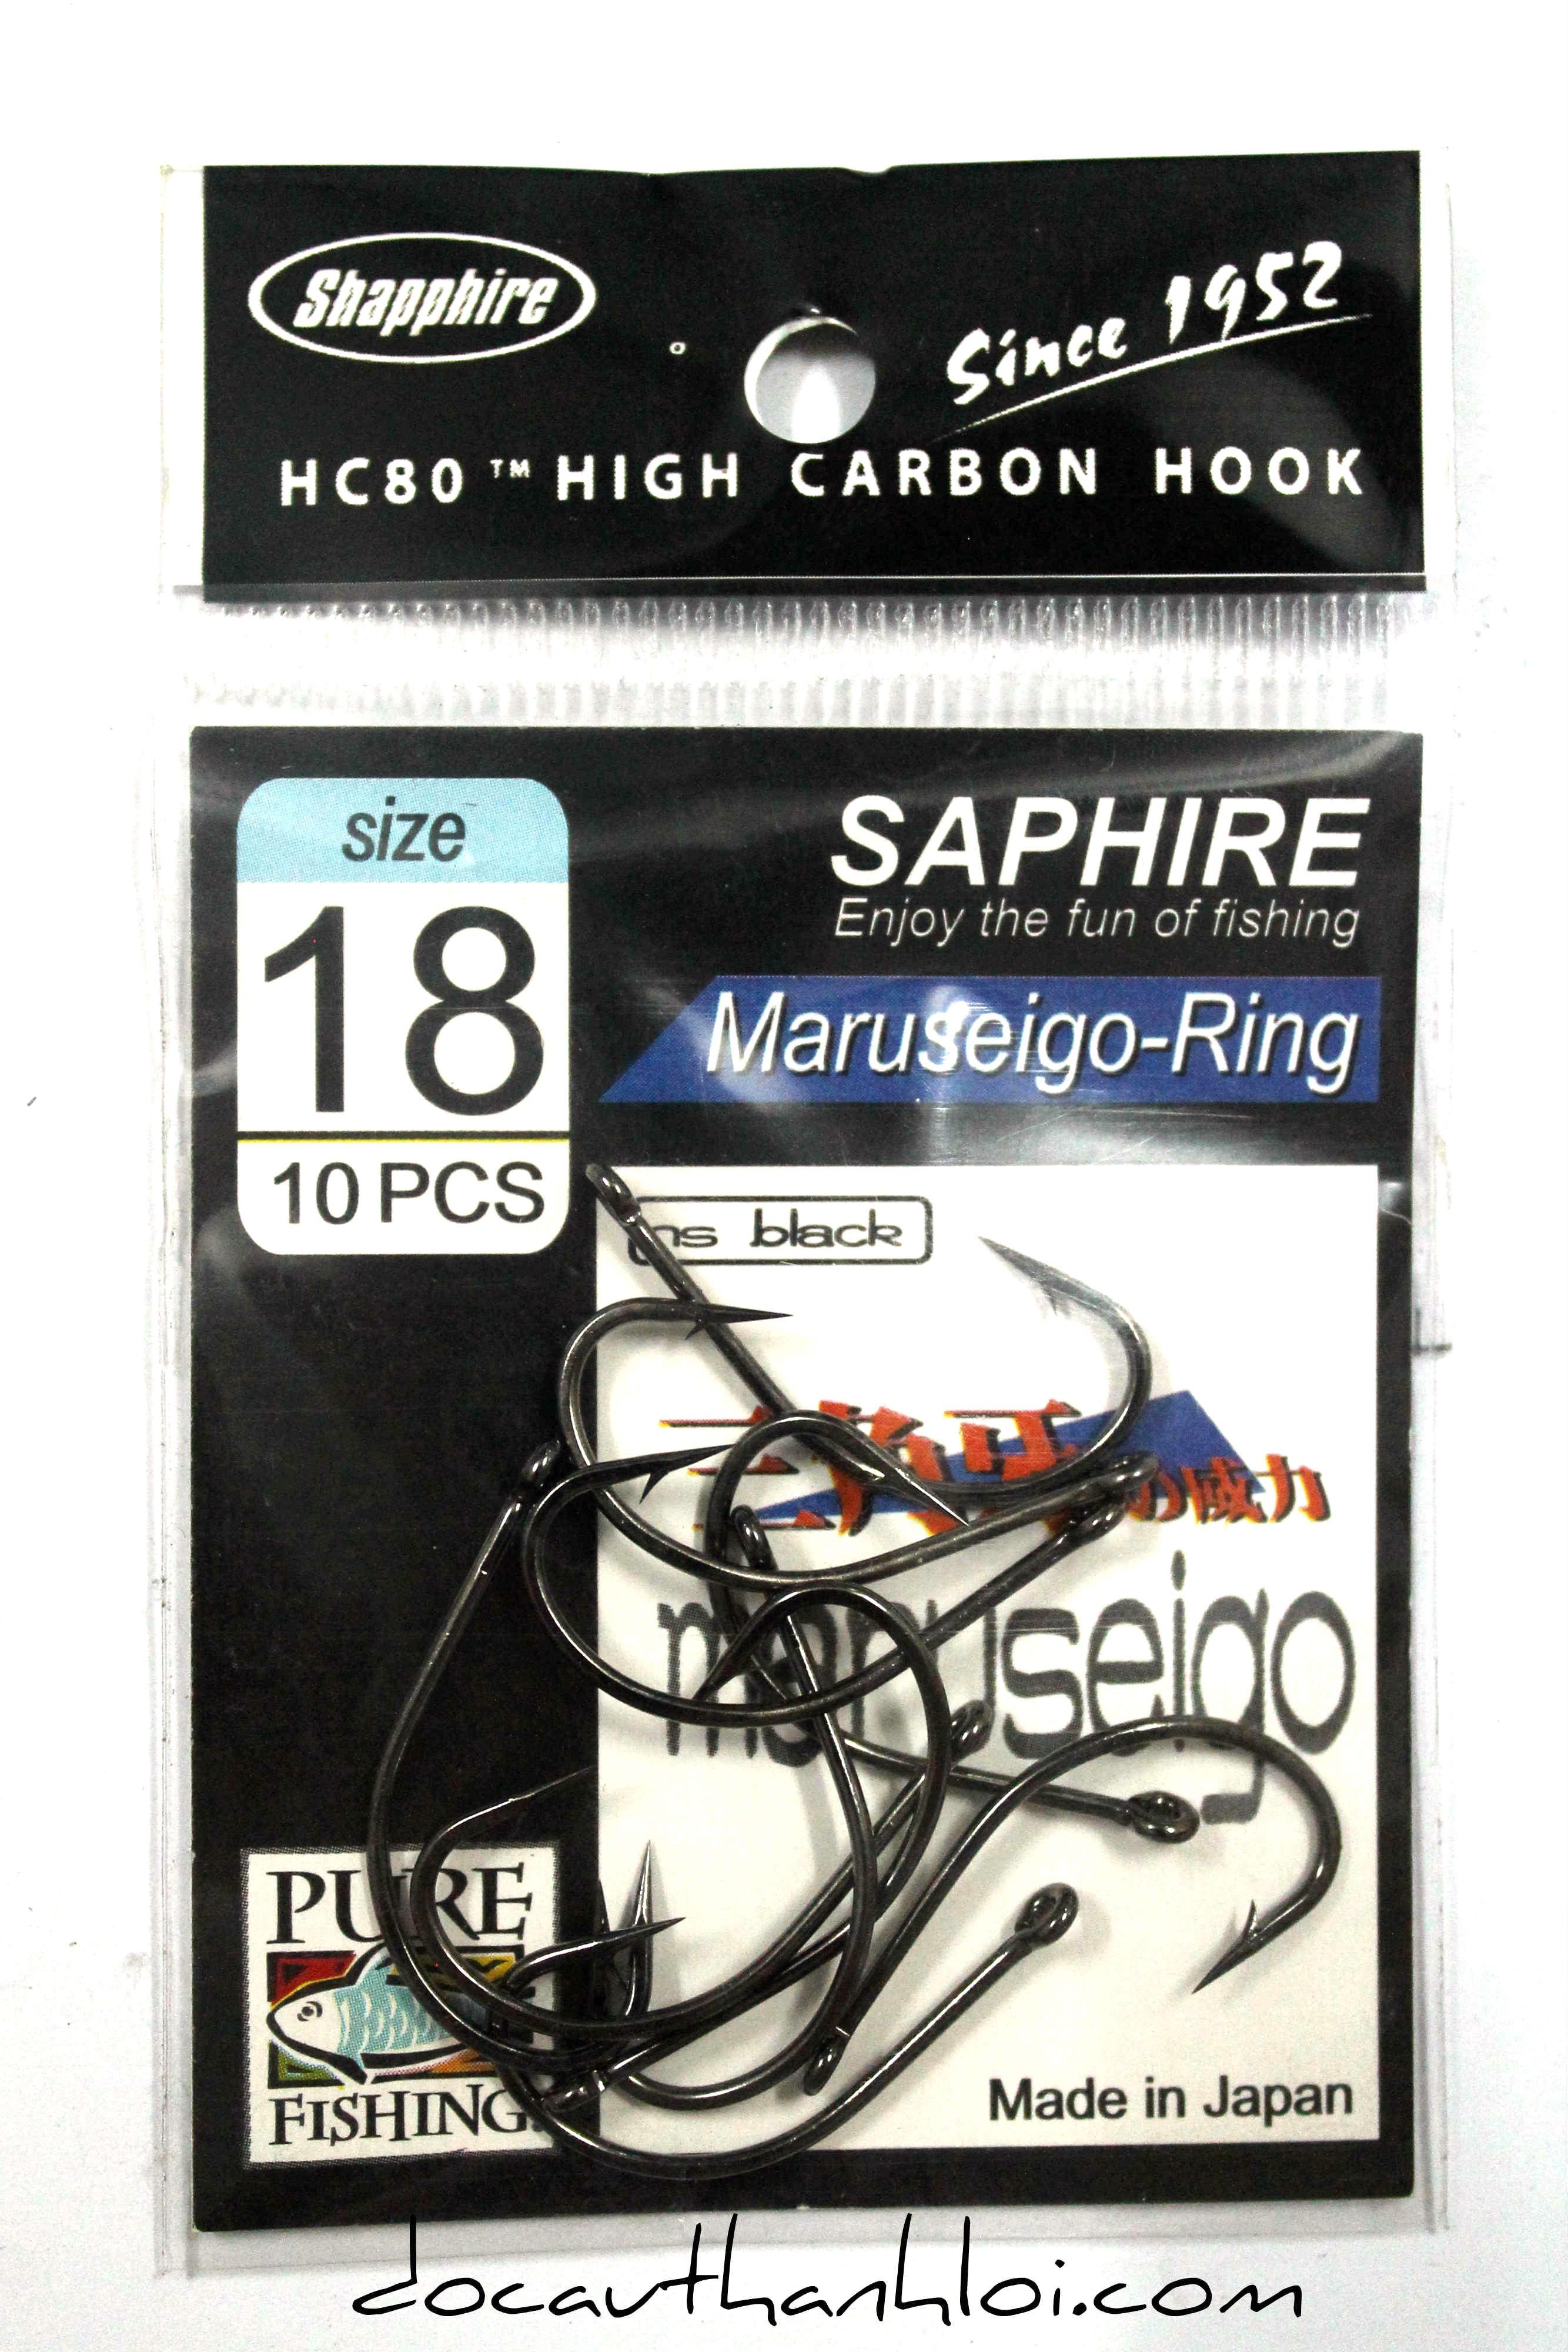 Lưỡi MARUSEIGO-RING   (Có Ngạnh- Khoen)    LC007